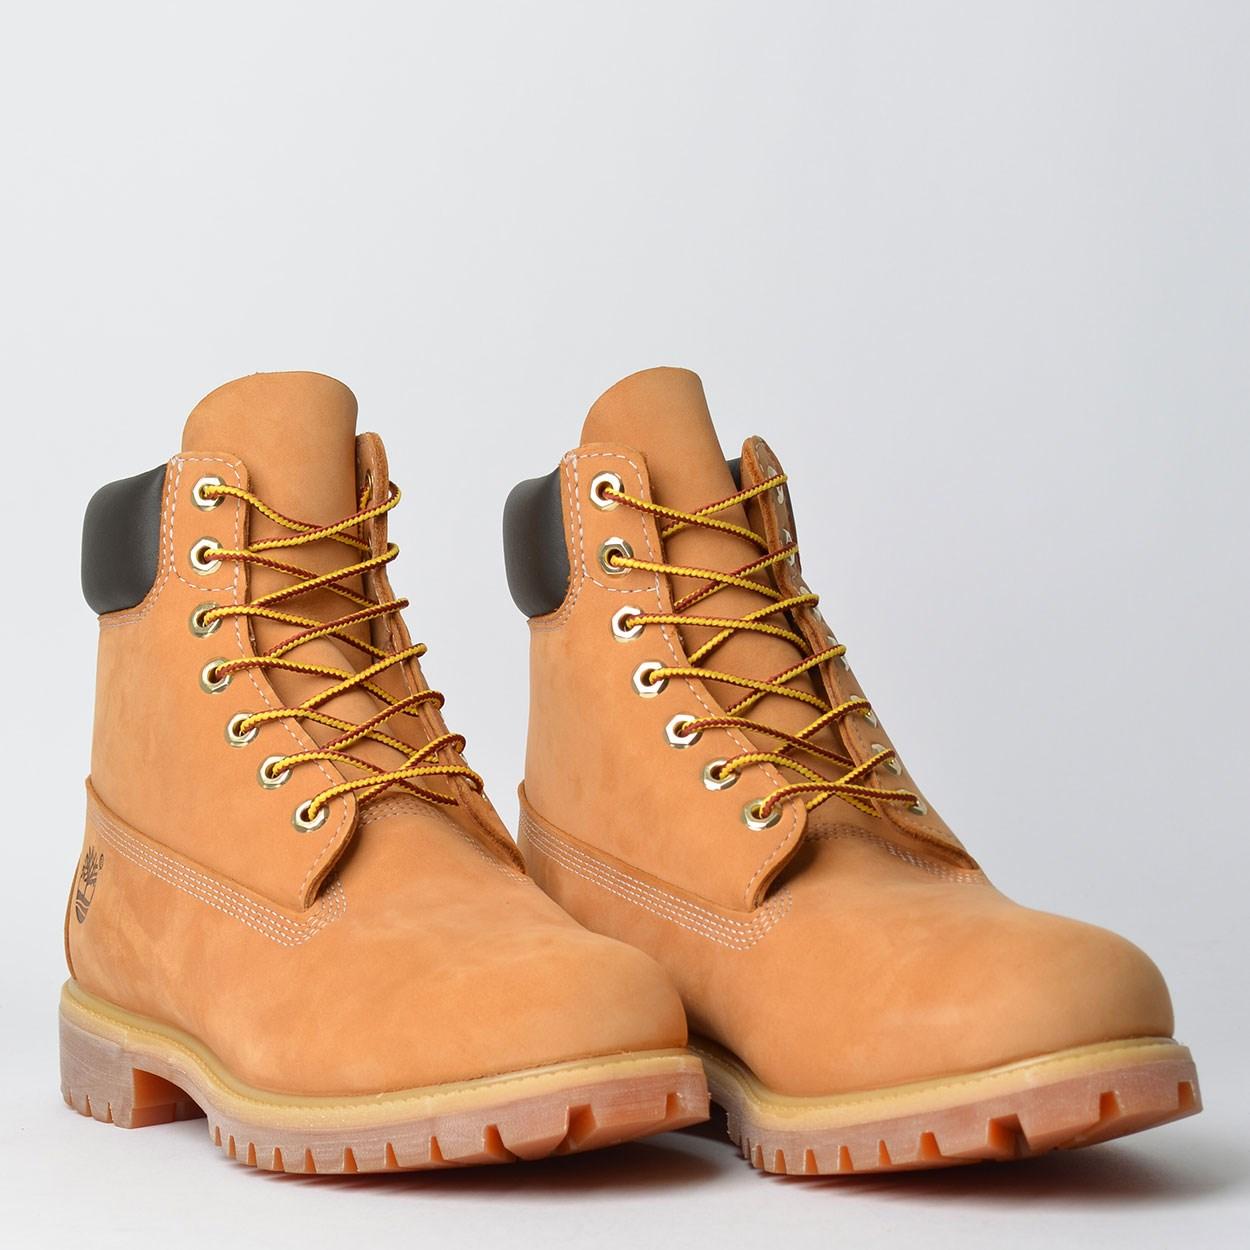 eac127e0596 Virus Factory Loja Bota Brown Boot 73 Timberland Tbbz10ag214 z55w0Rq